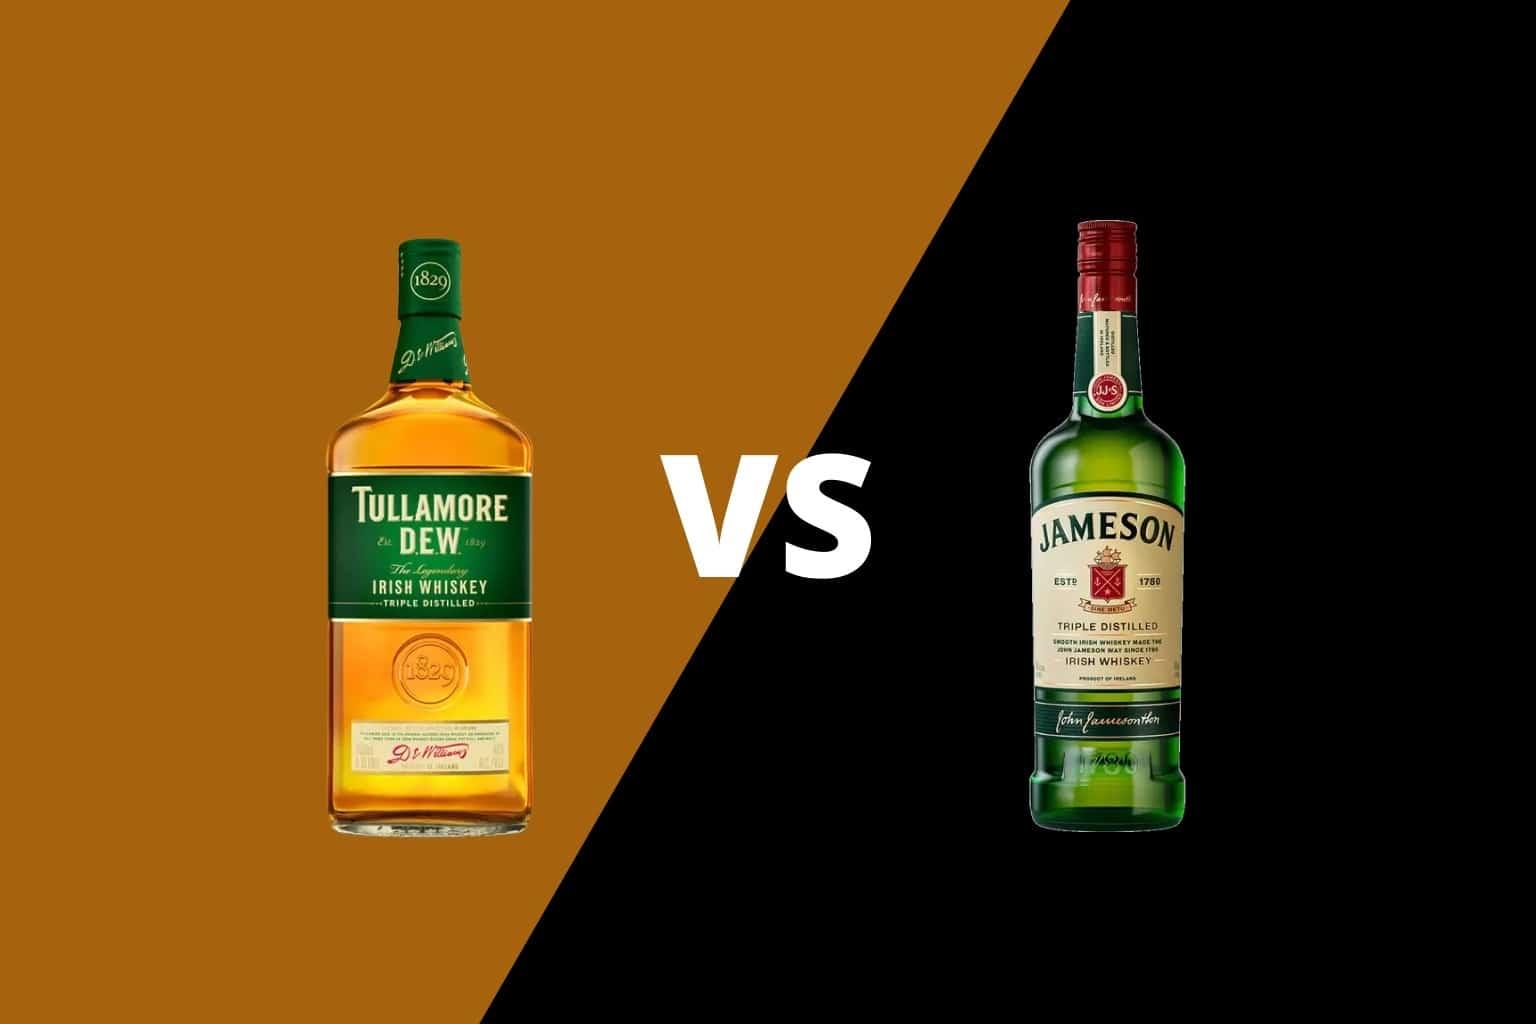 Tullamore DEW vs Jameson